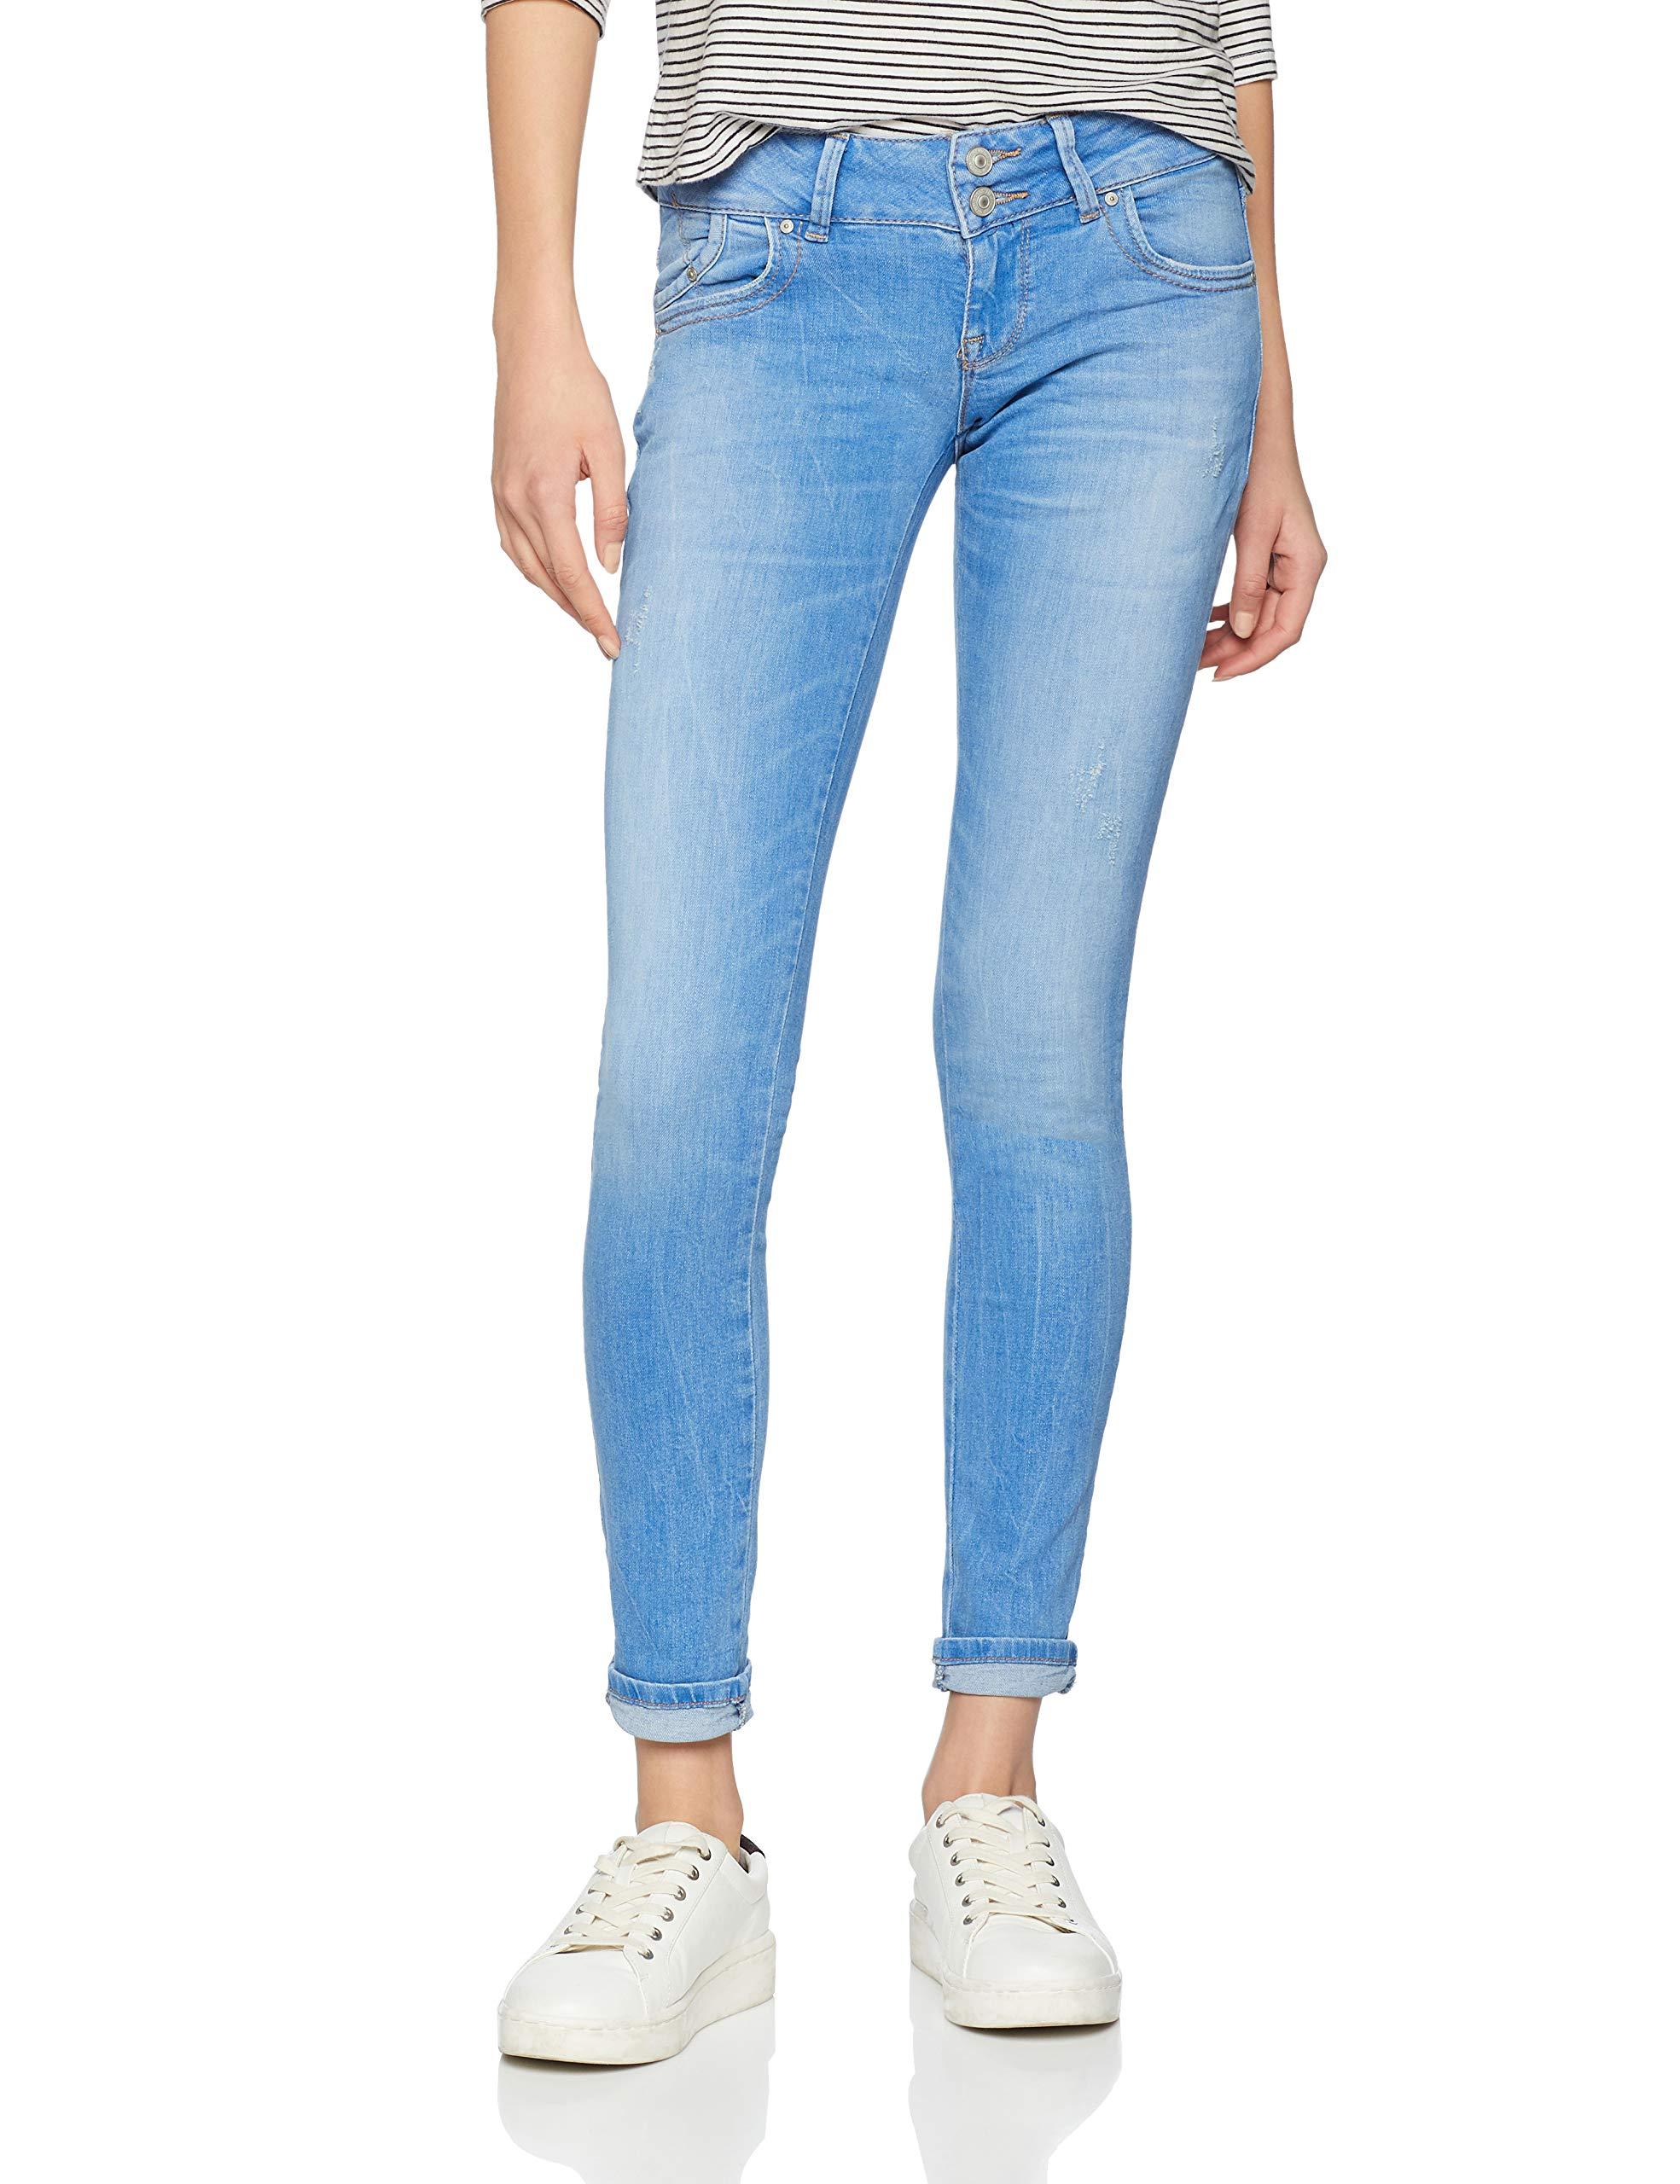 l32 Femme Ltb SlimBleuakira 51621W26 Jean Wash Jeans X Molly nkOw0P